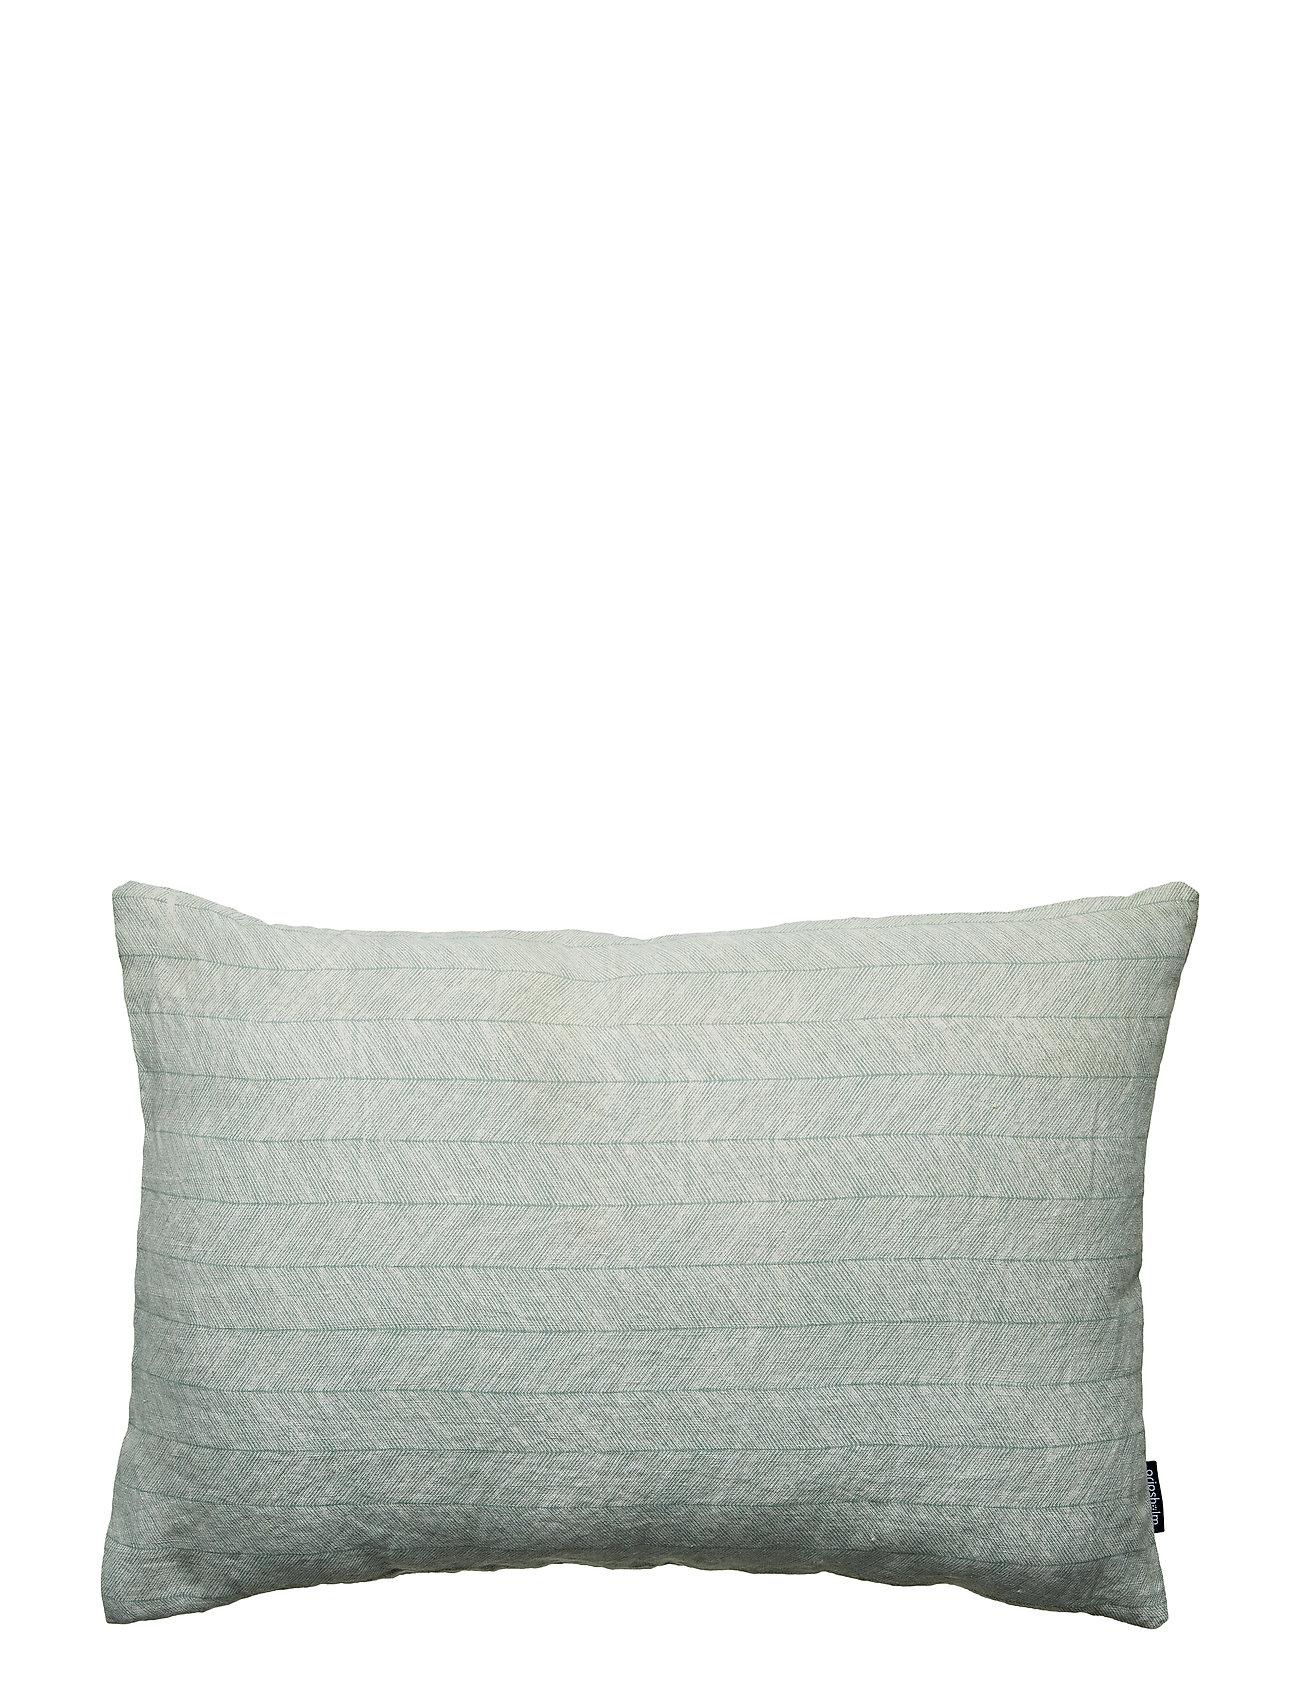 Cover Cushion GrayGripsholm Arvidaqua Cushion Arvidaqua GrayGripsholm Cover Cushion Cover EID9H2